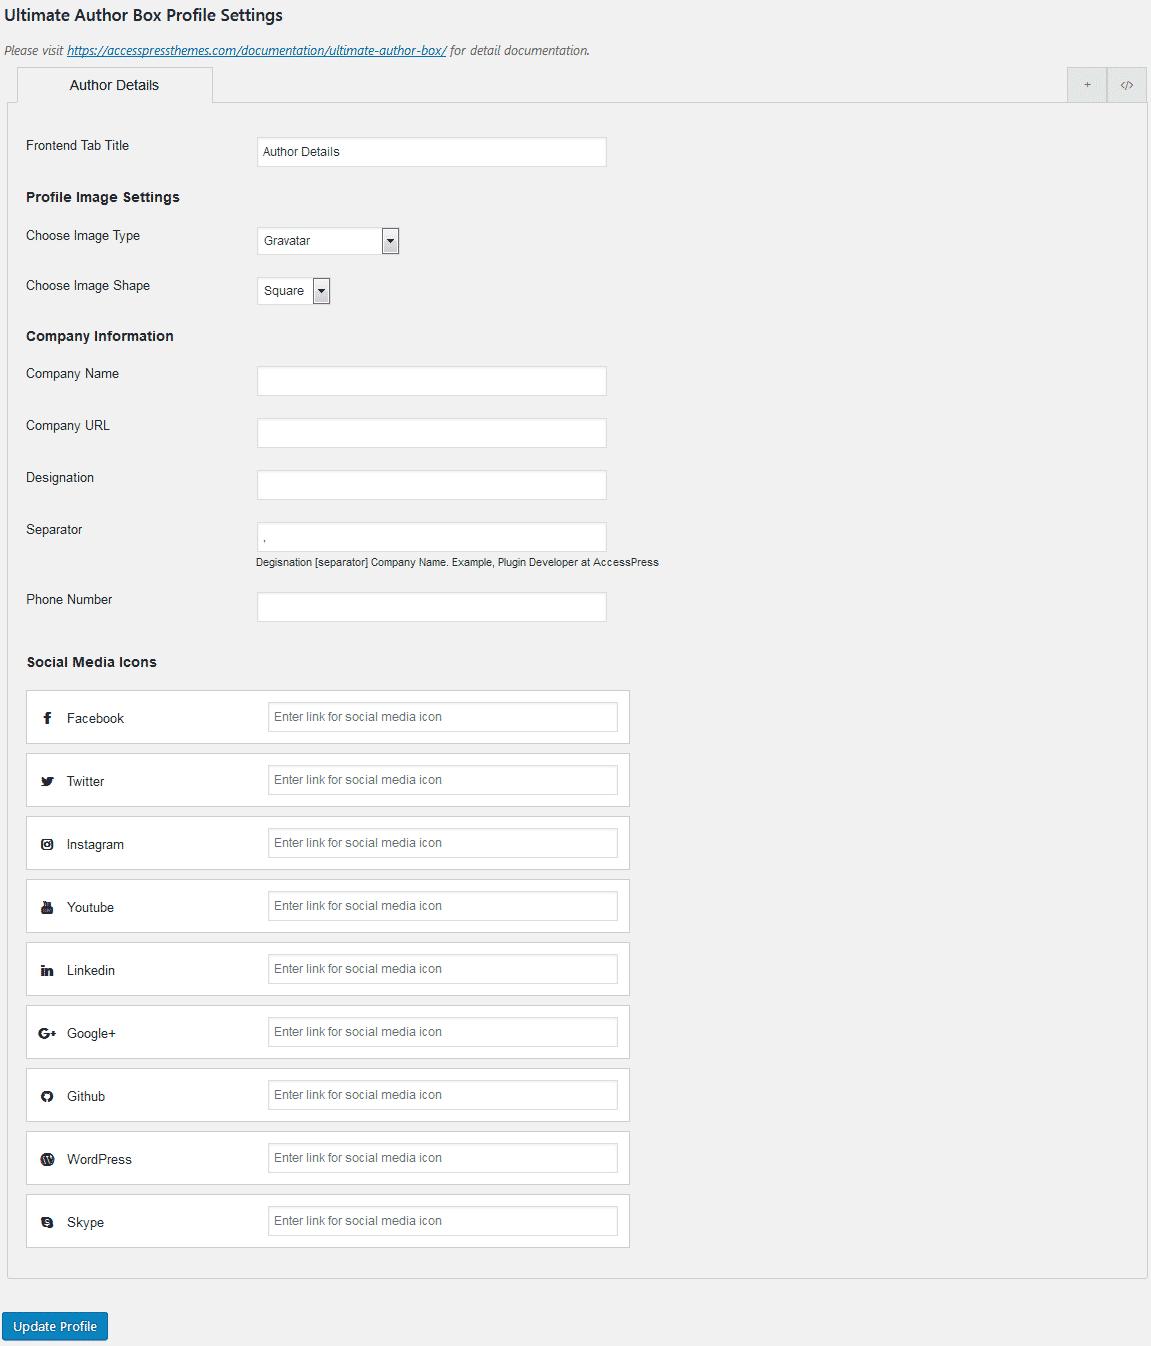 Ultimate Author Box Lite: Profile Settings